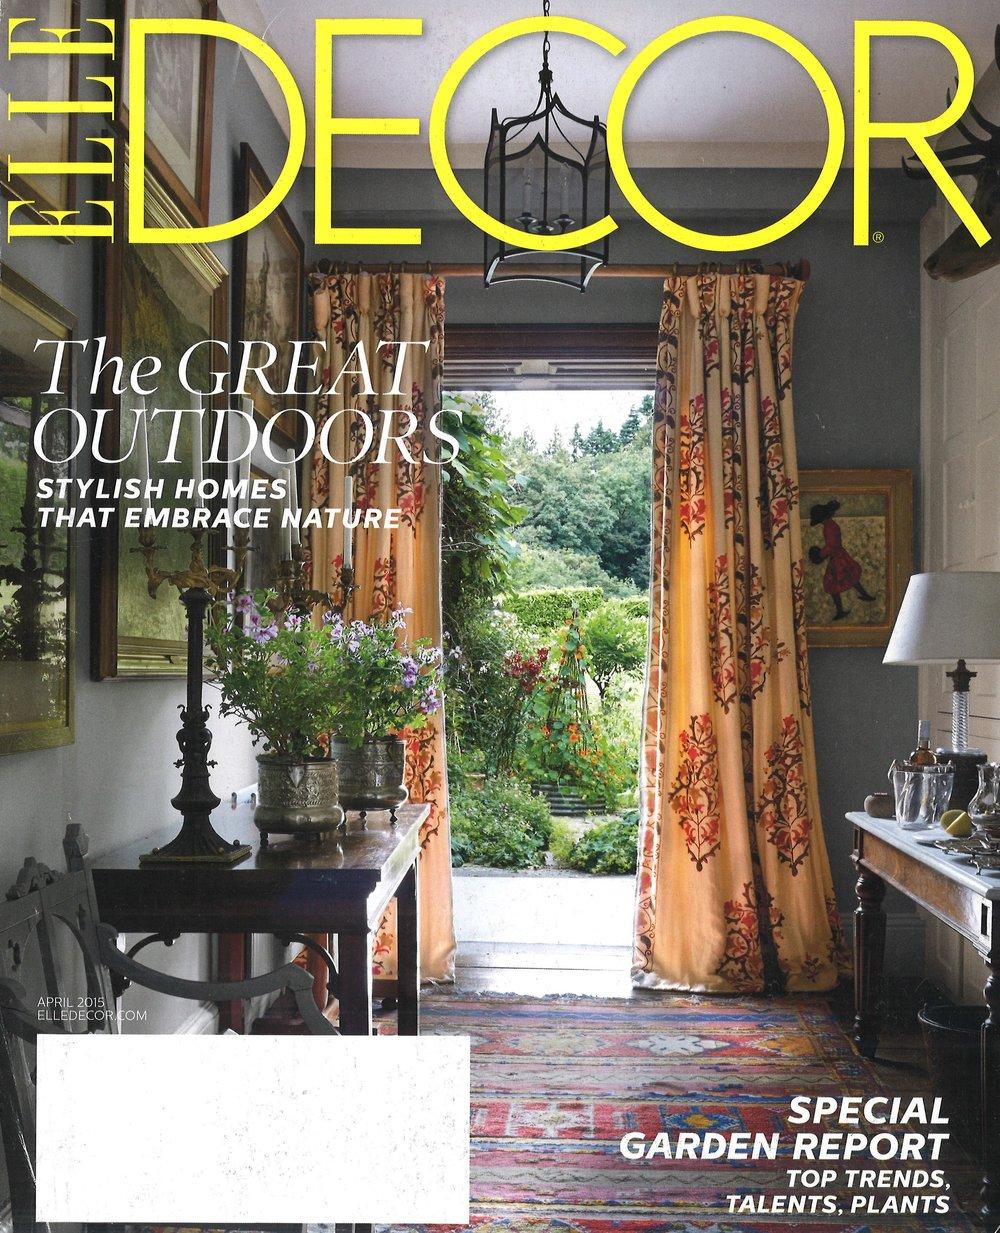 ED april2015 cover.jpg